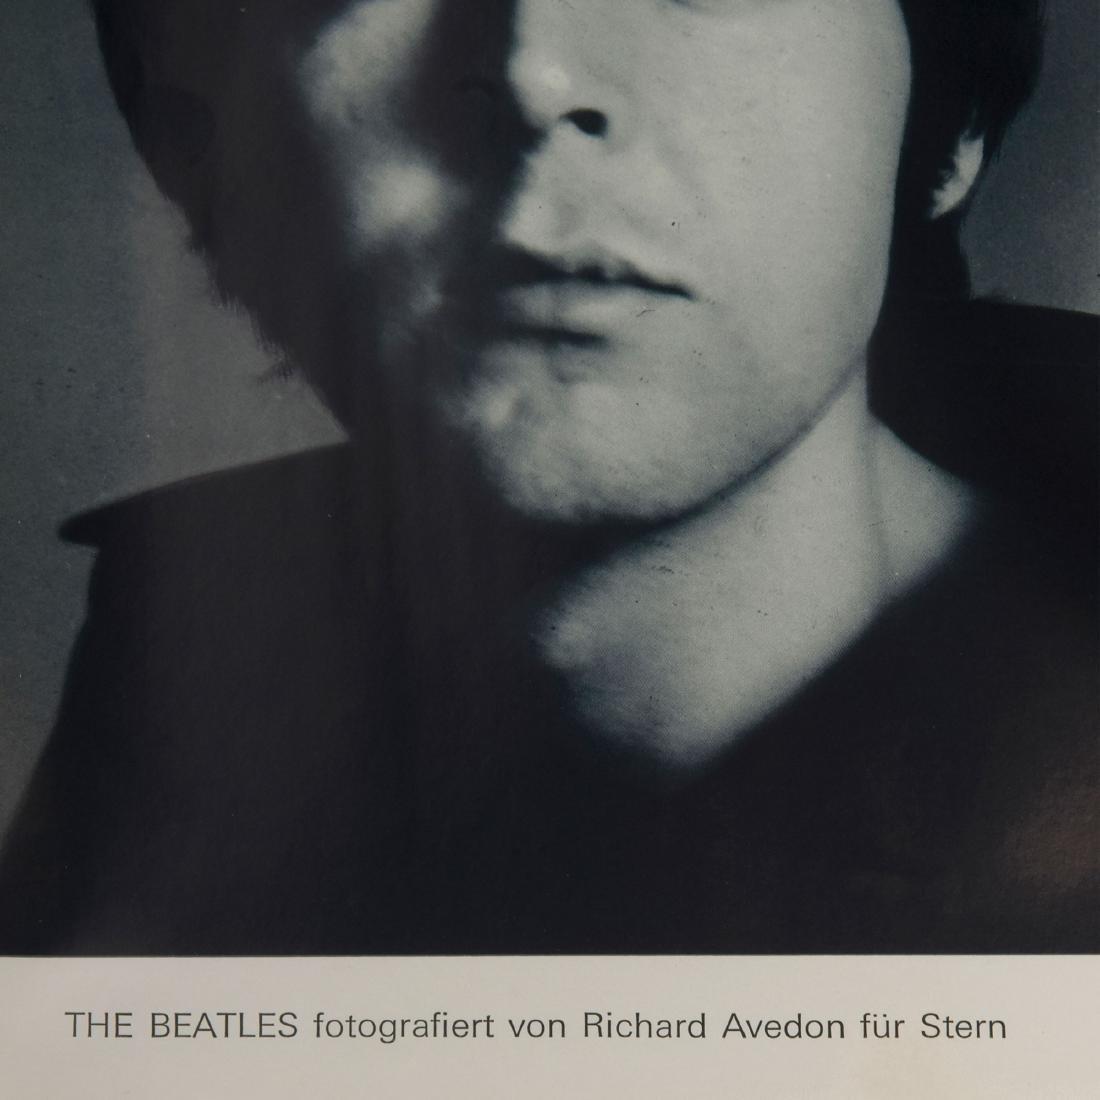 Five 'Beatles' posters, 1967 - 5